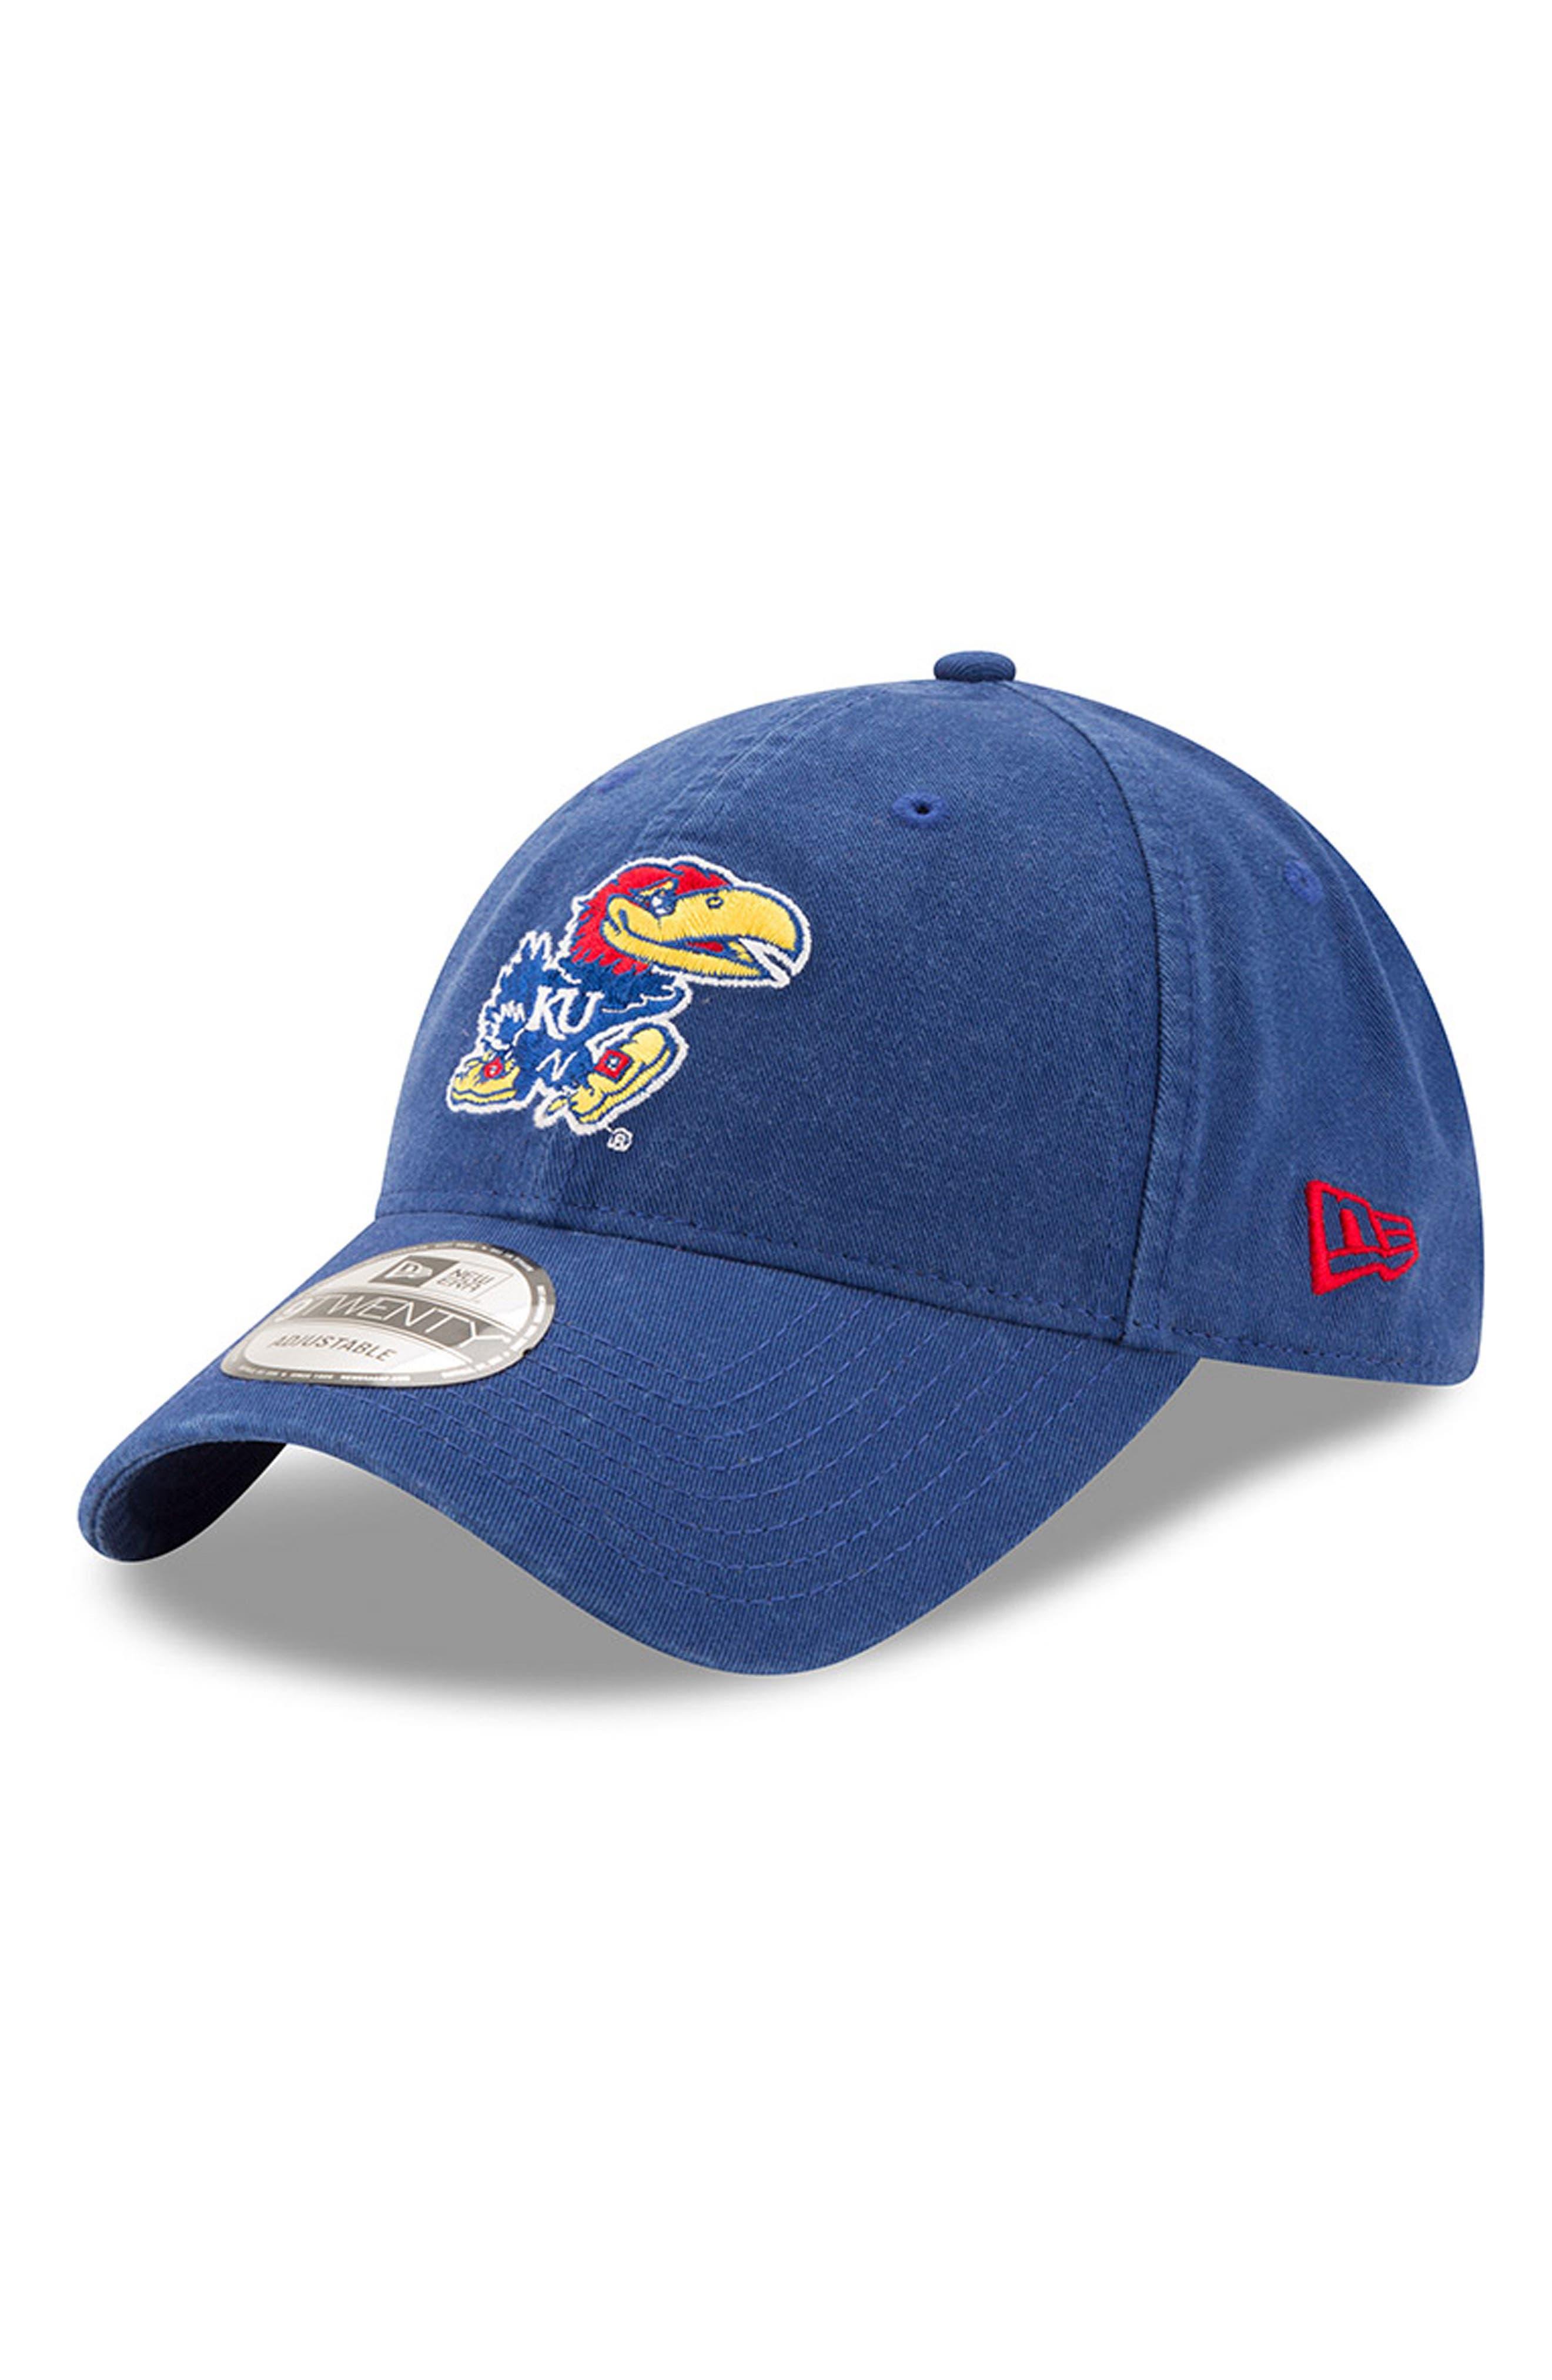 Alternate Image 1 Selected - New Era Collegiate Core Classic - Kansas Jayhawks Baseball Cap